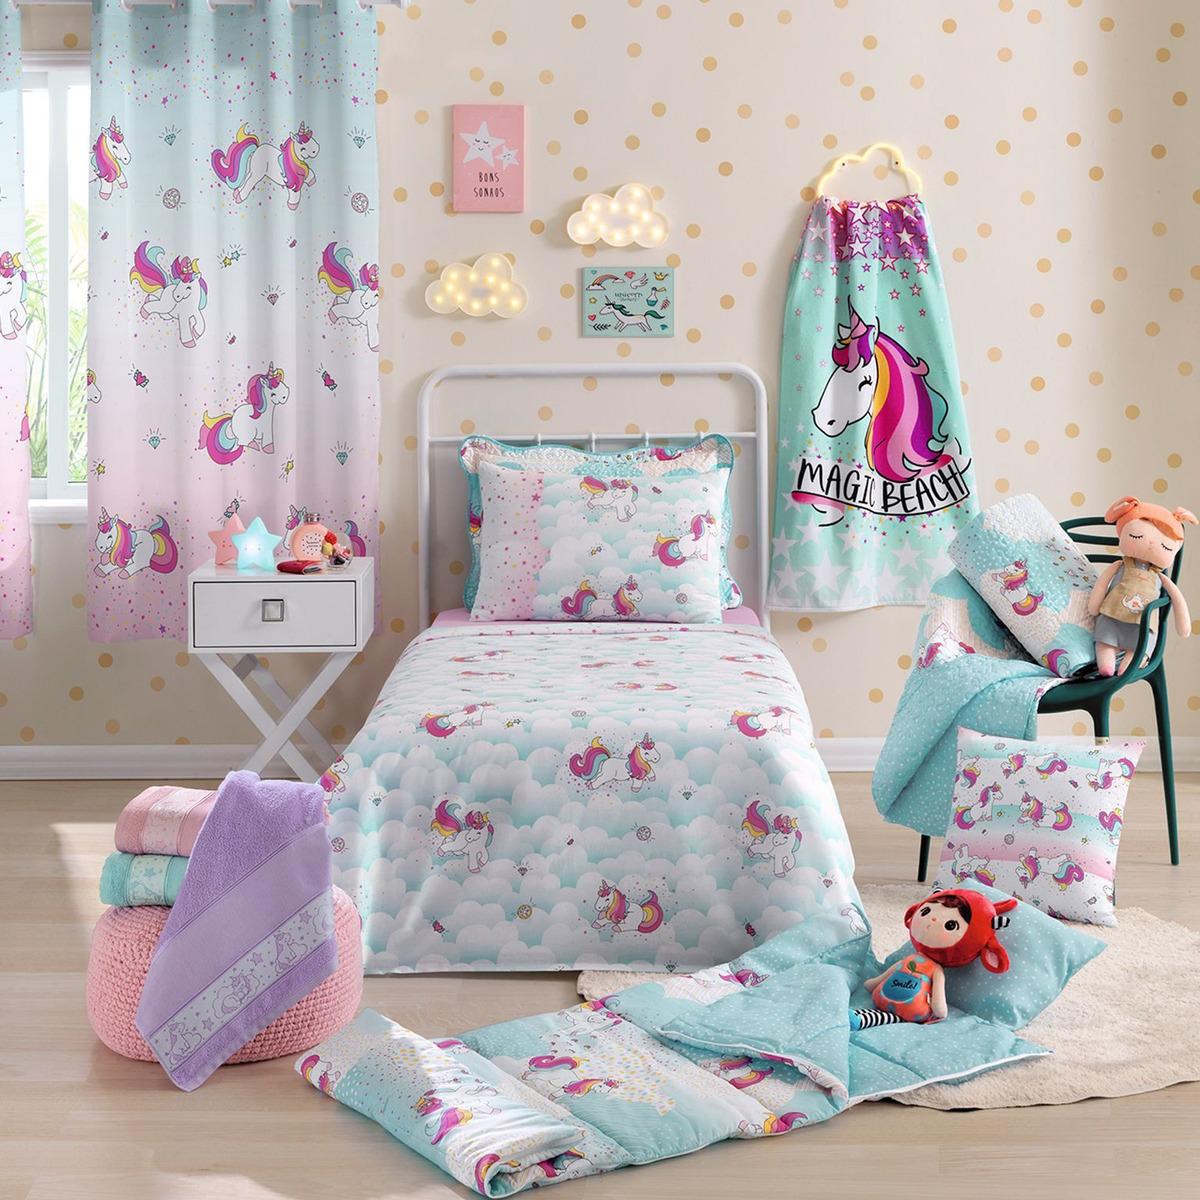 72c9528974 kit infantil menina unicórnio colcha + jogo d cama + cortina. Carregando  zoom.